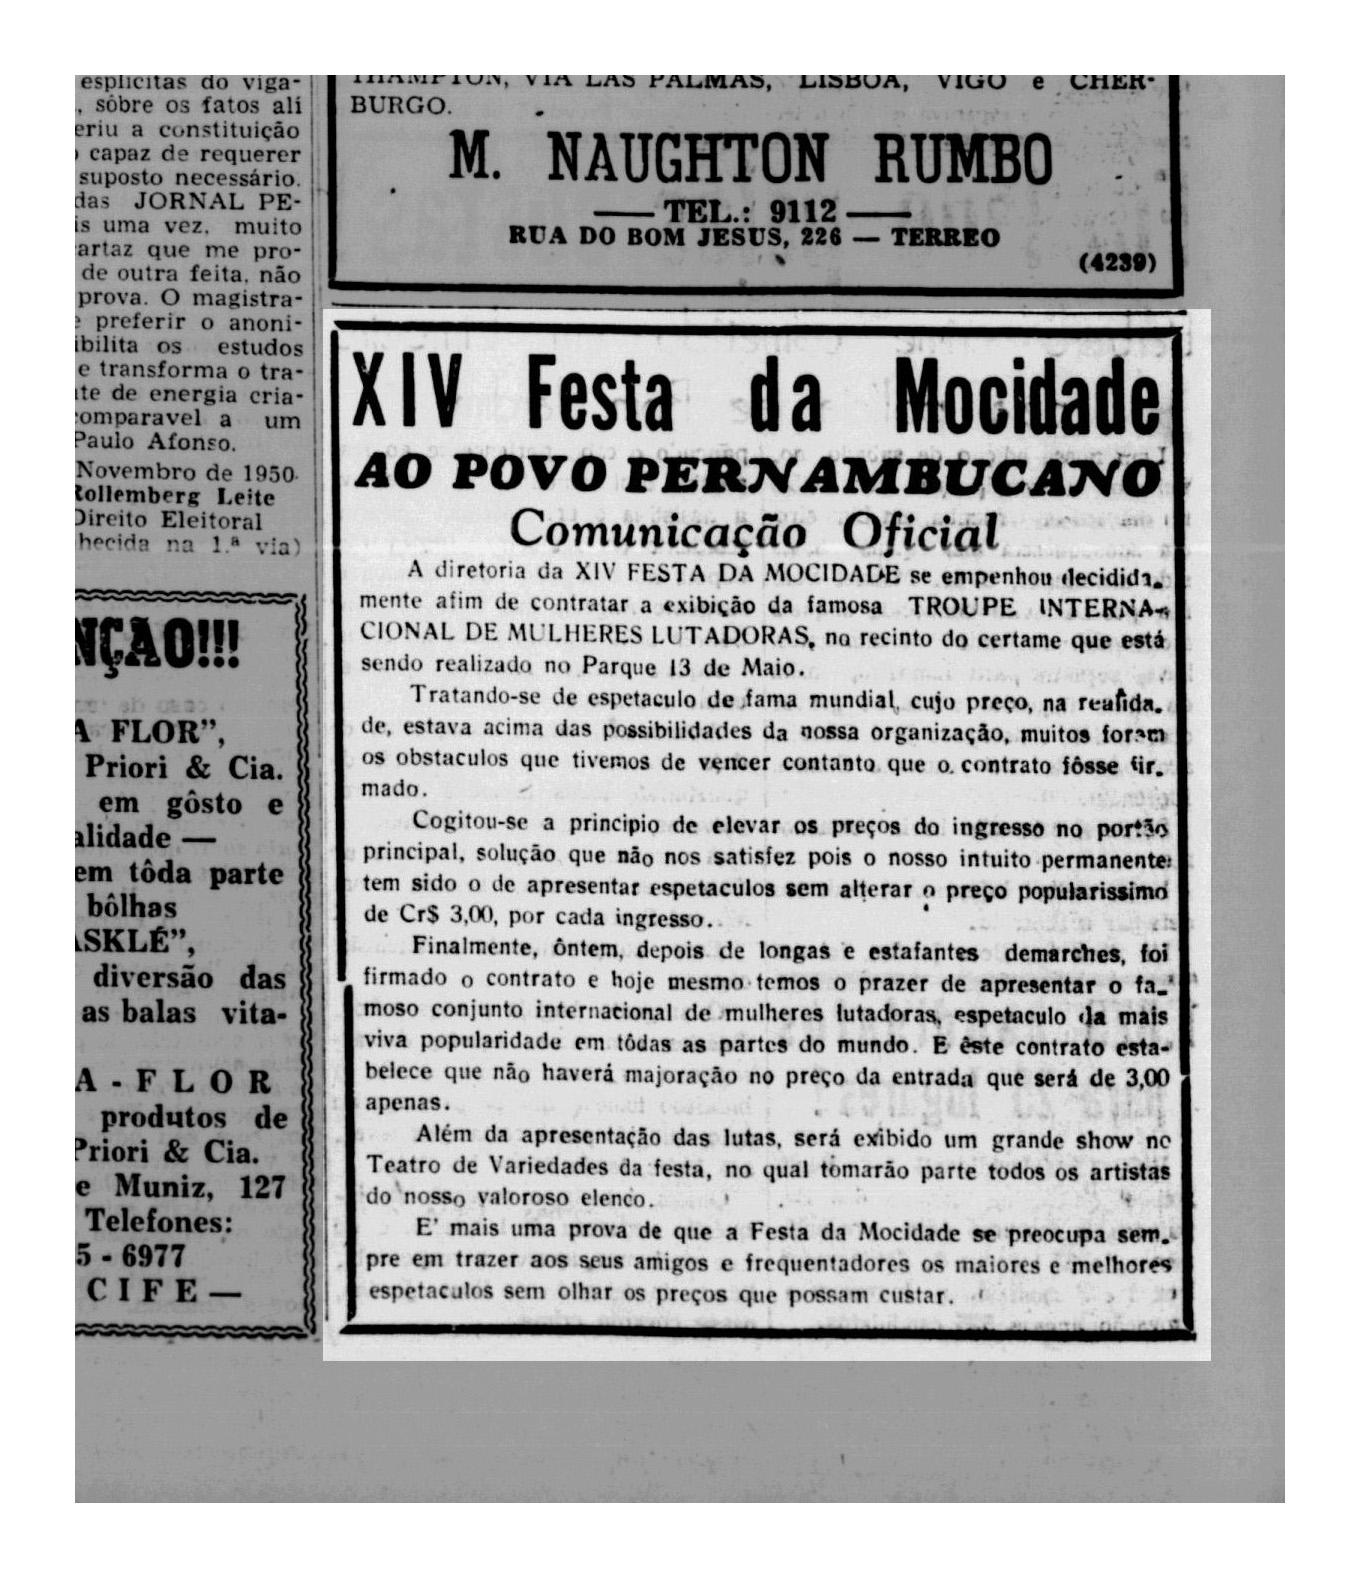 Maria-Wiesner-1951-01-15_JornalPequeno_Recife-PE_01-2-copy1.jpg